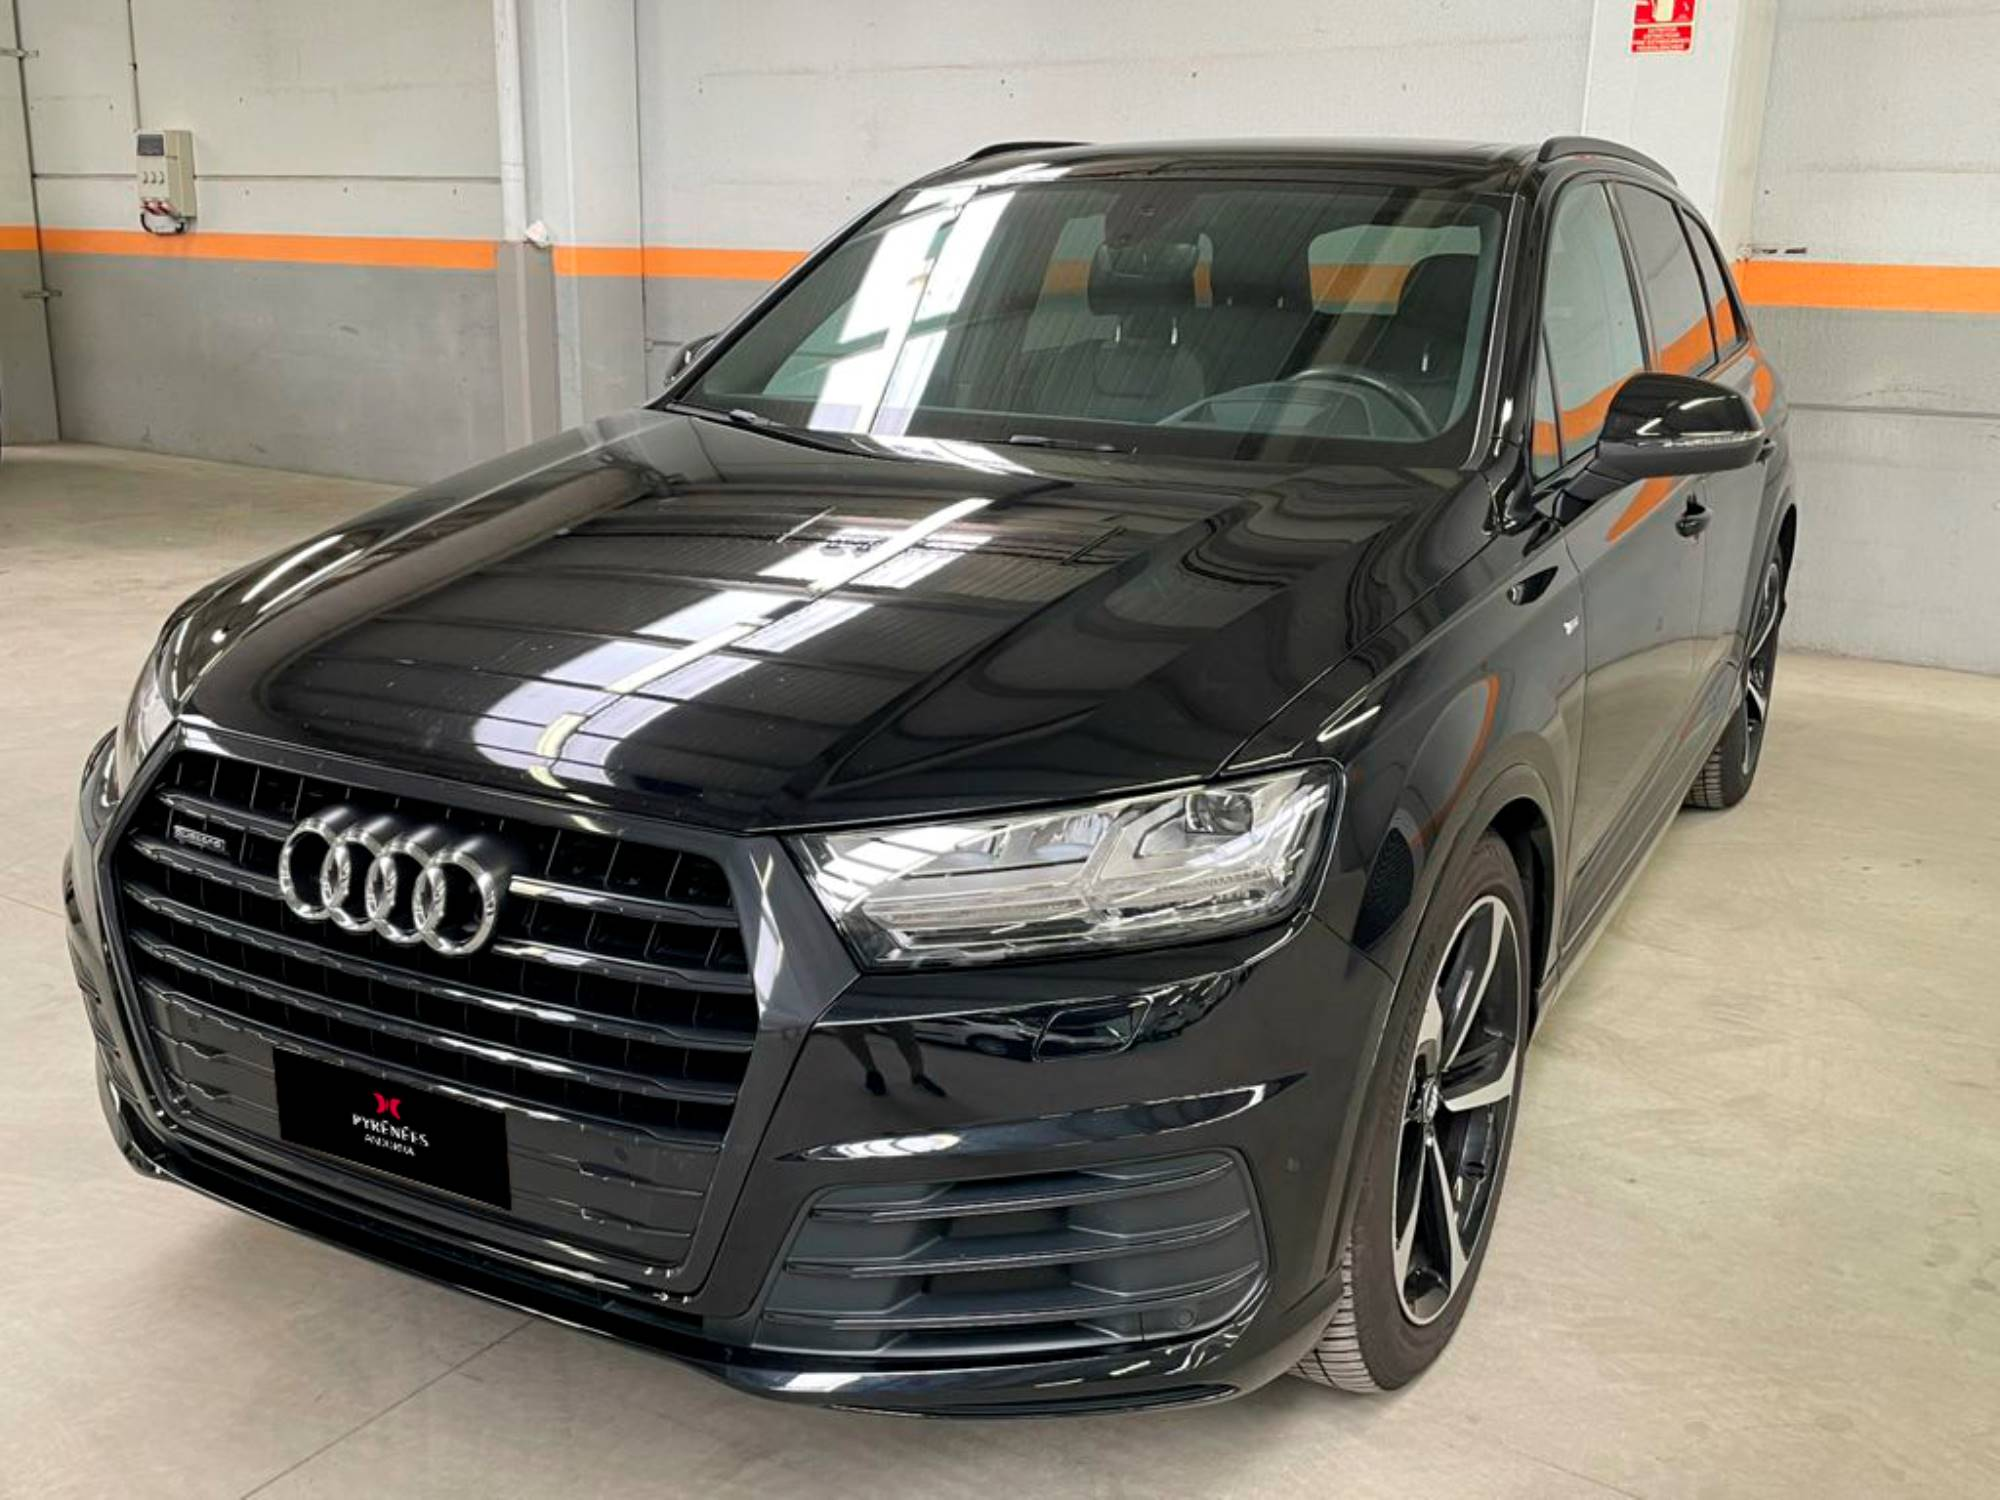 Audi - Q7 - 3.0 V6 TDI 3.0 V6 TDI Dièsel  2016  49.000 Km